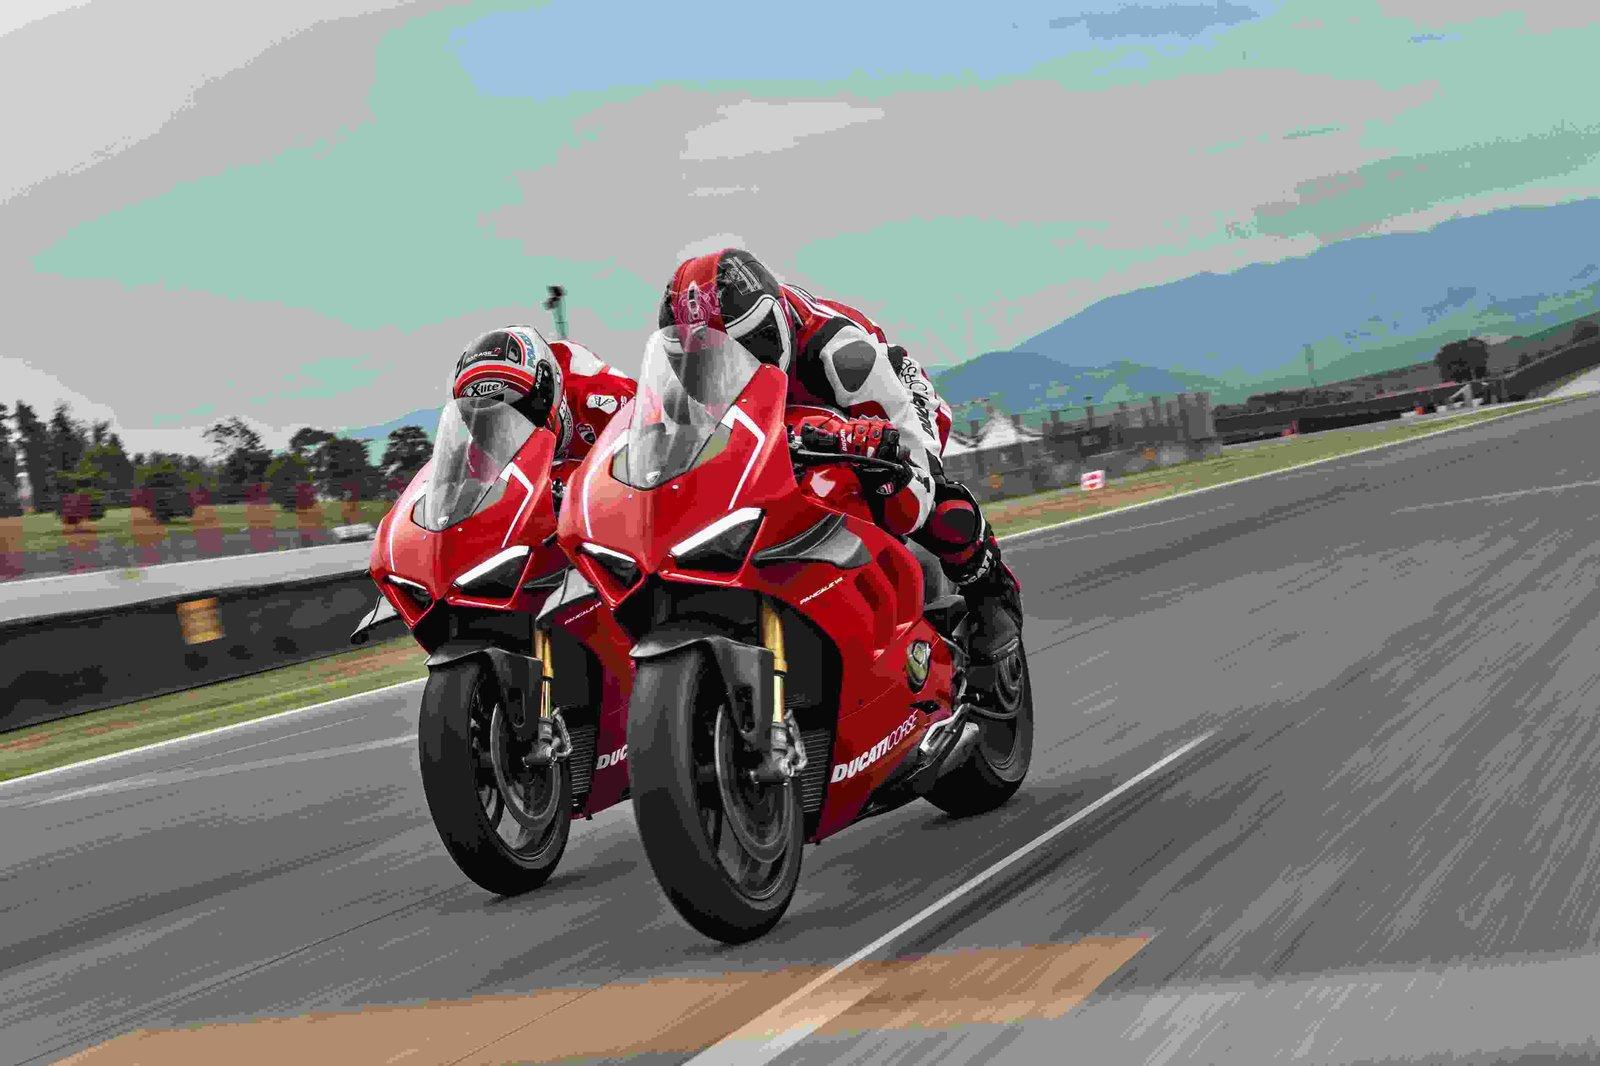 Ducati ad EICMA 2018 (7).jpg